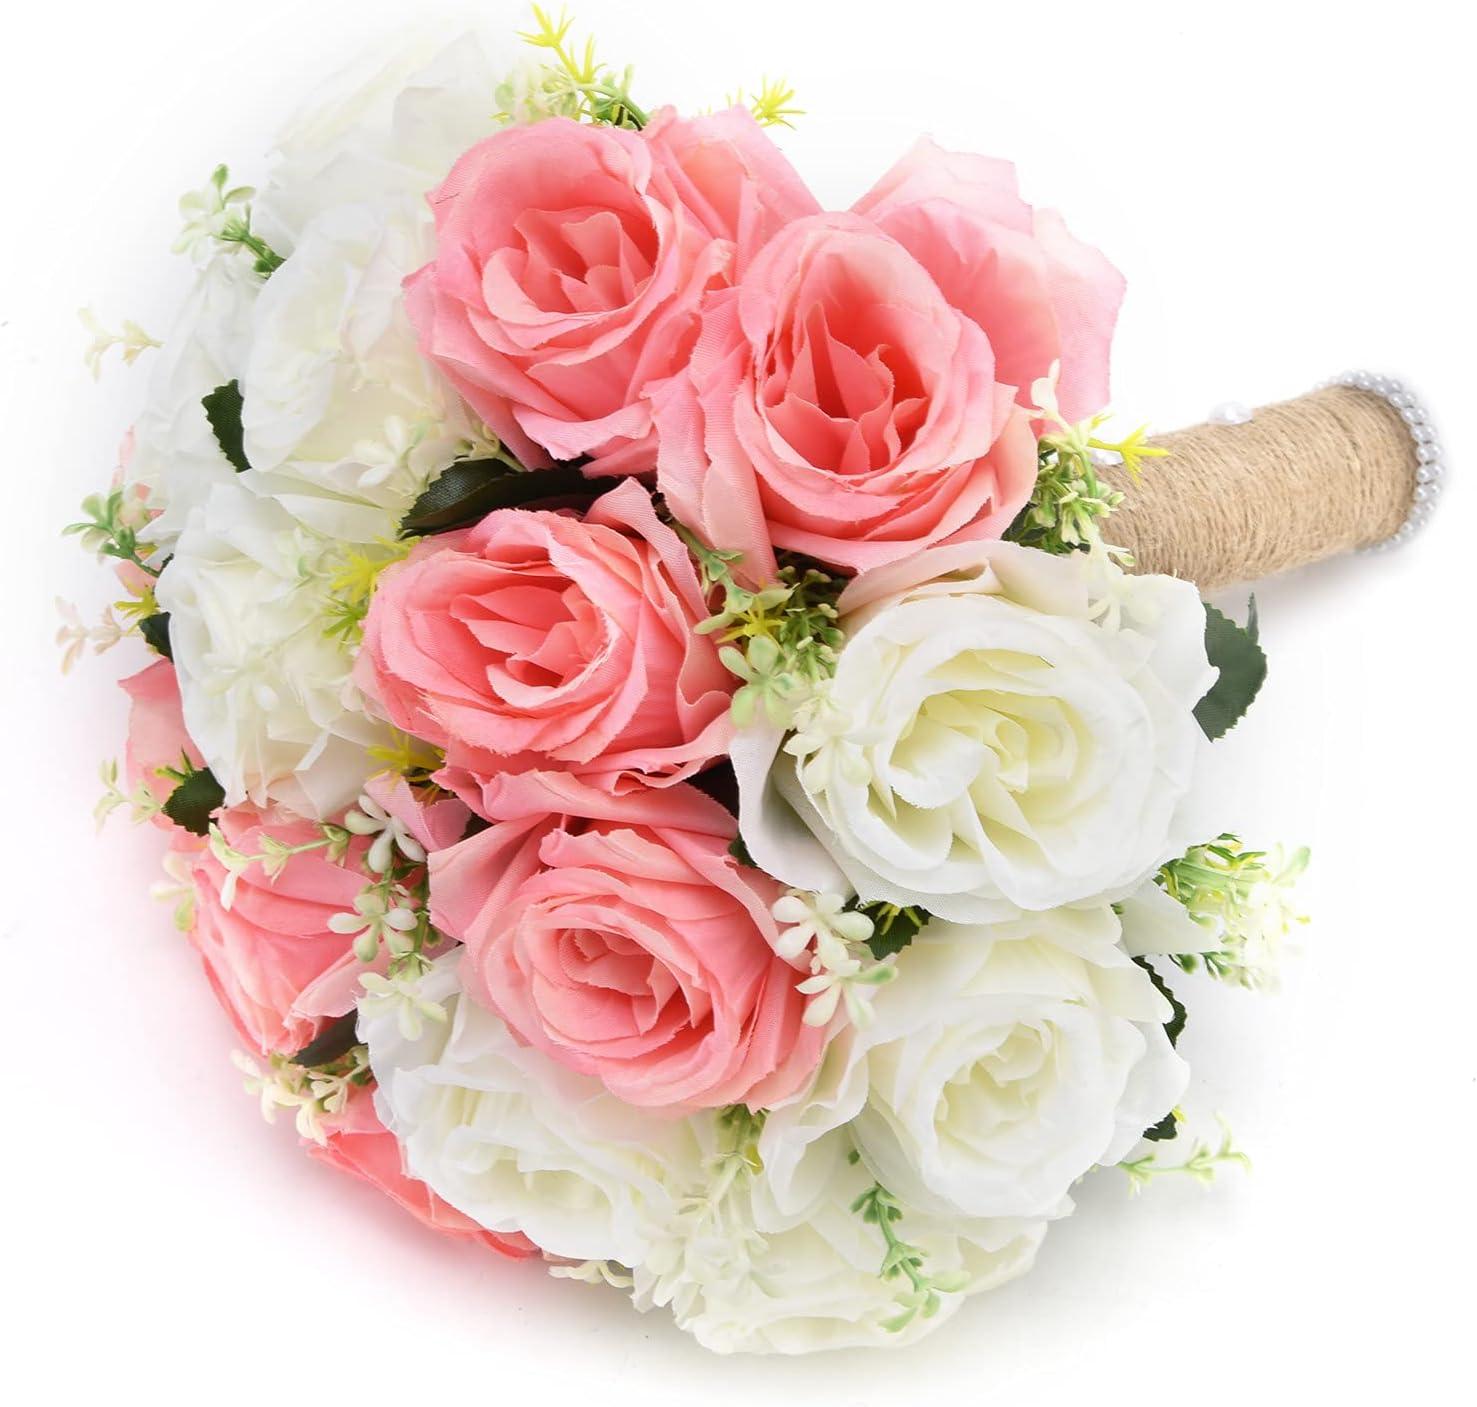 Luroze Fake Flowers Decoration Artificial F Bouquet Silk Our shop OFFers the best service Large discharge sale Bridal